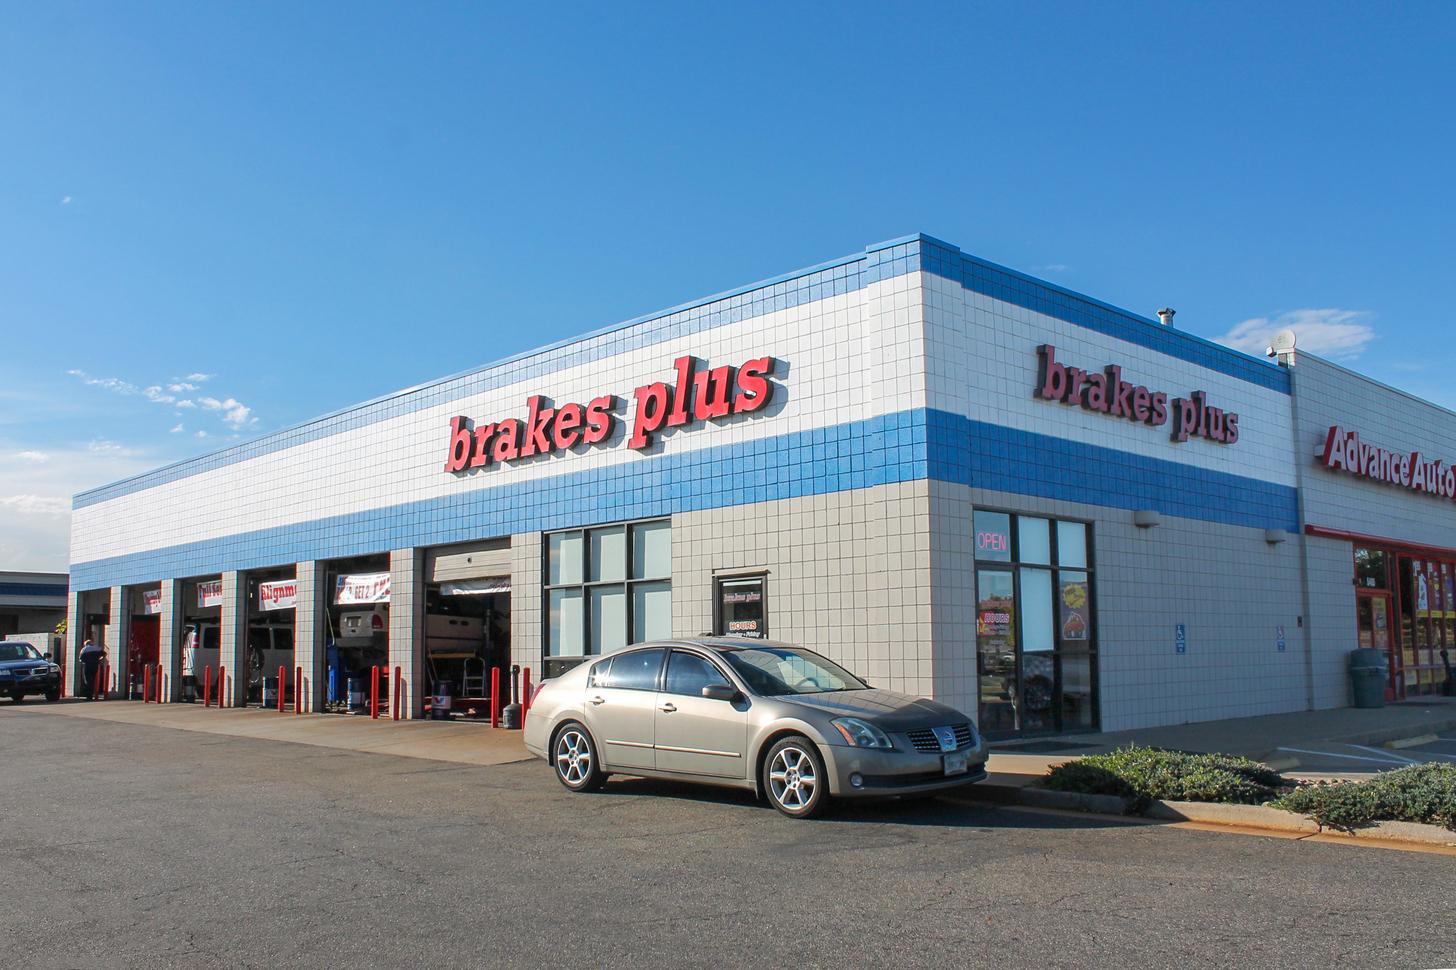 Brakes Plus at Lakewood, CO - Westland Town Center